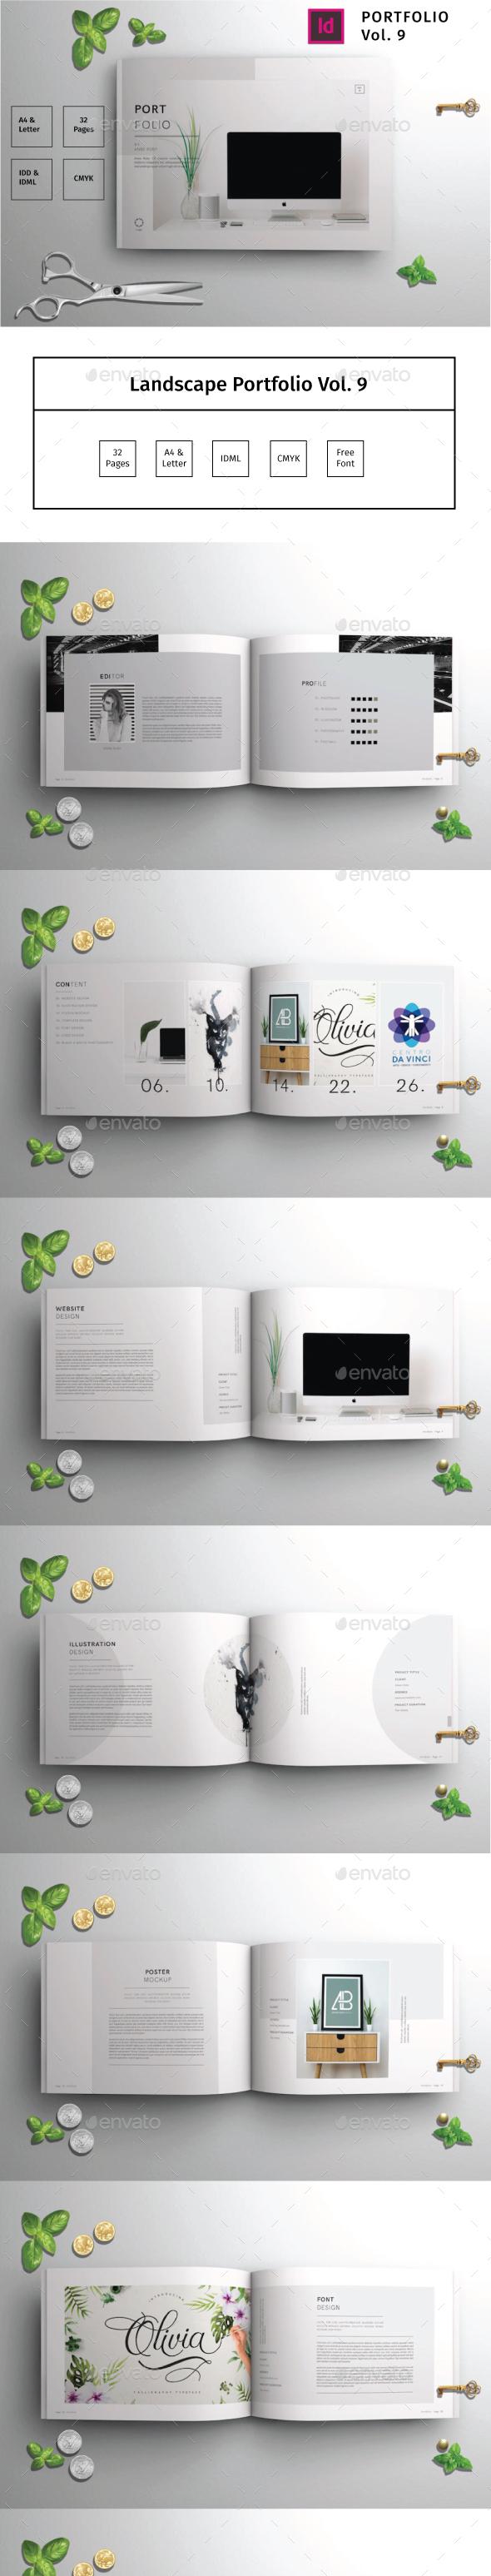 Landscape Portfolio Vol.9 - Portfolio Brochures